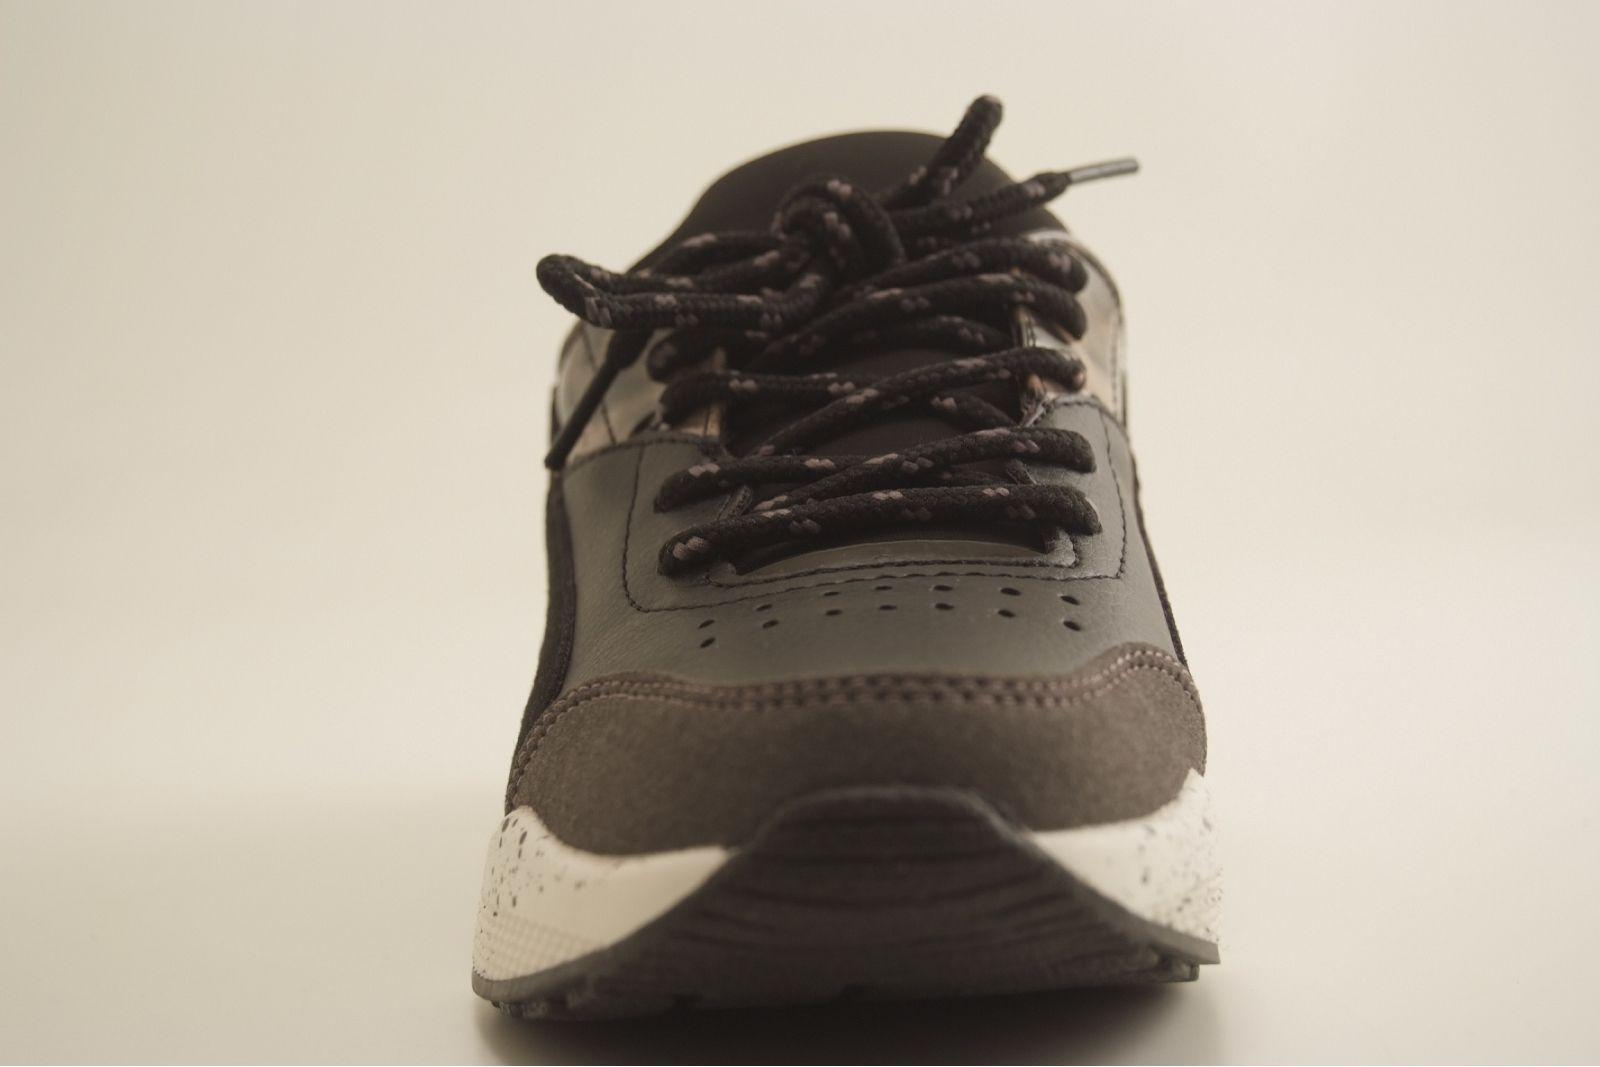 Basket REQINS femme tendance noir/beige    PROMO